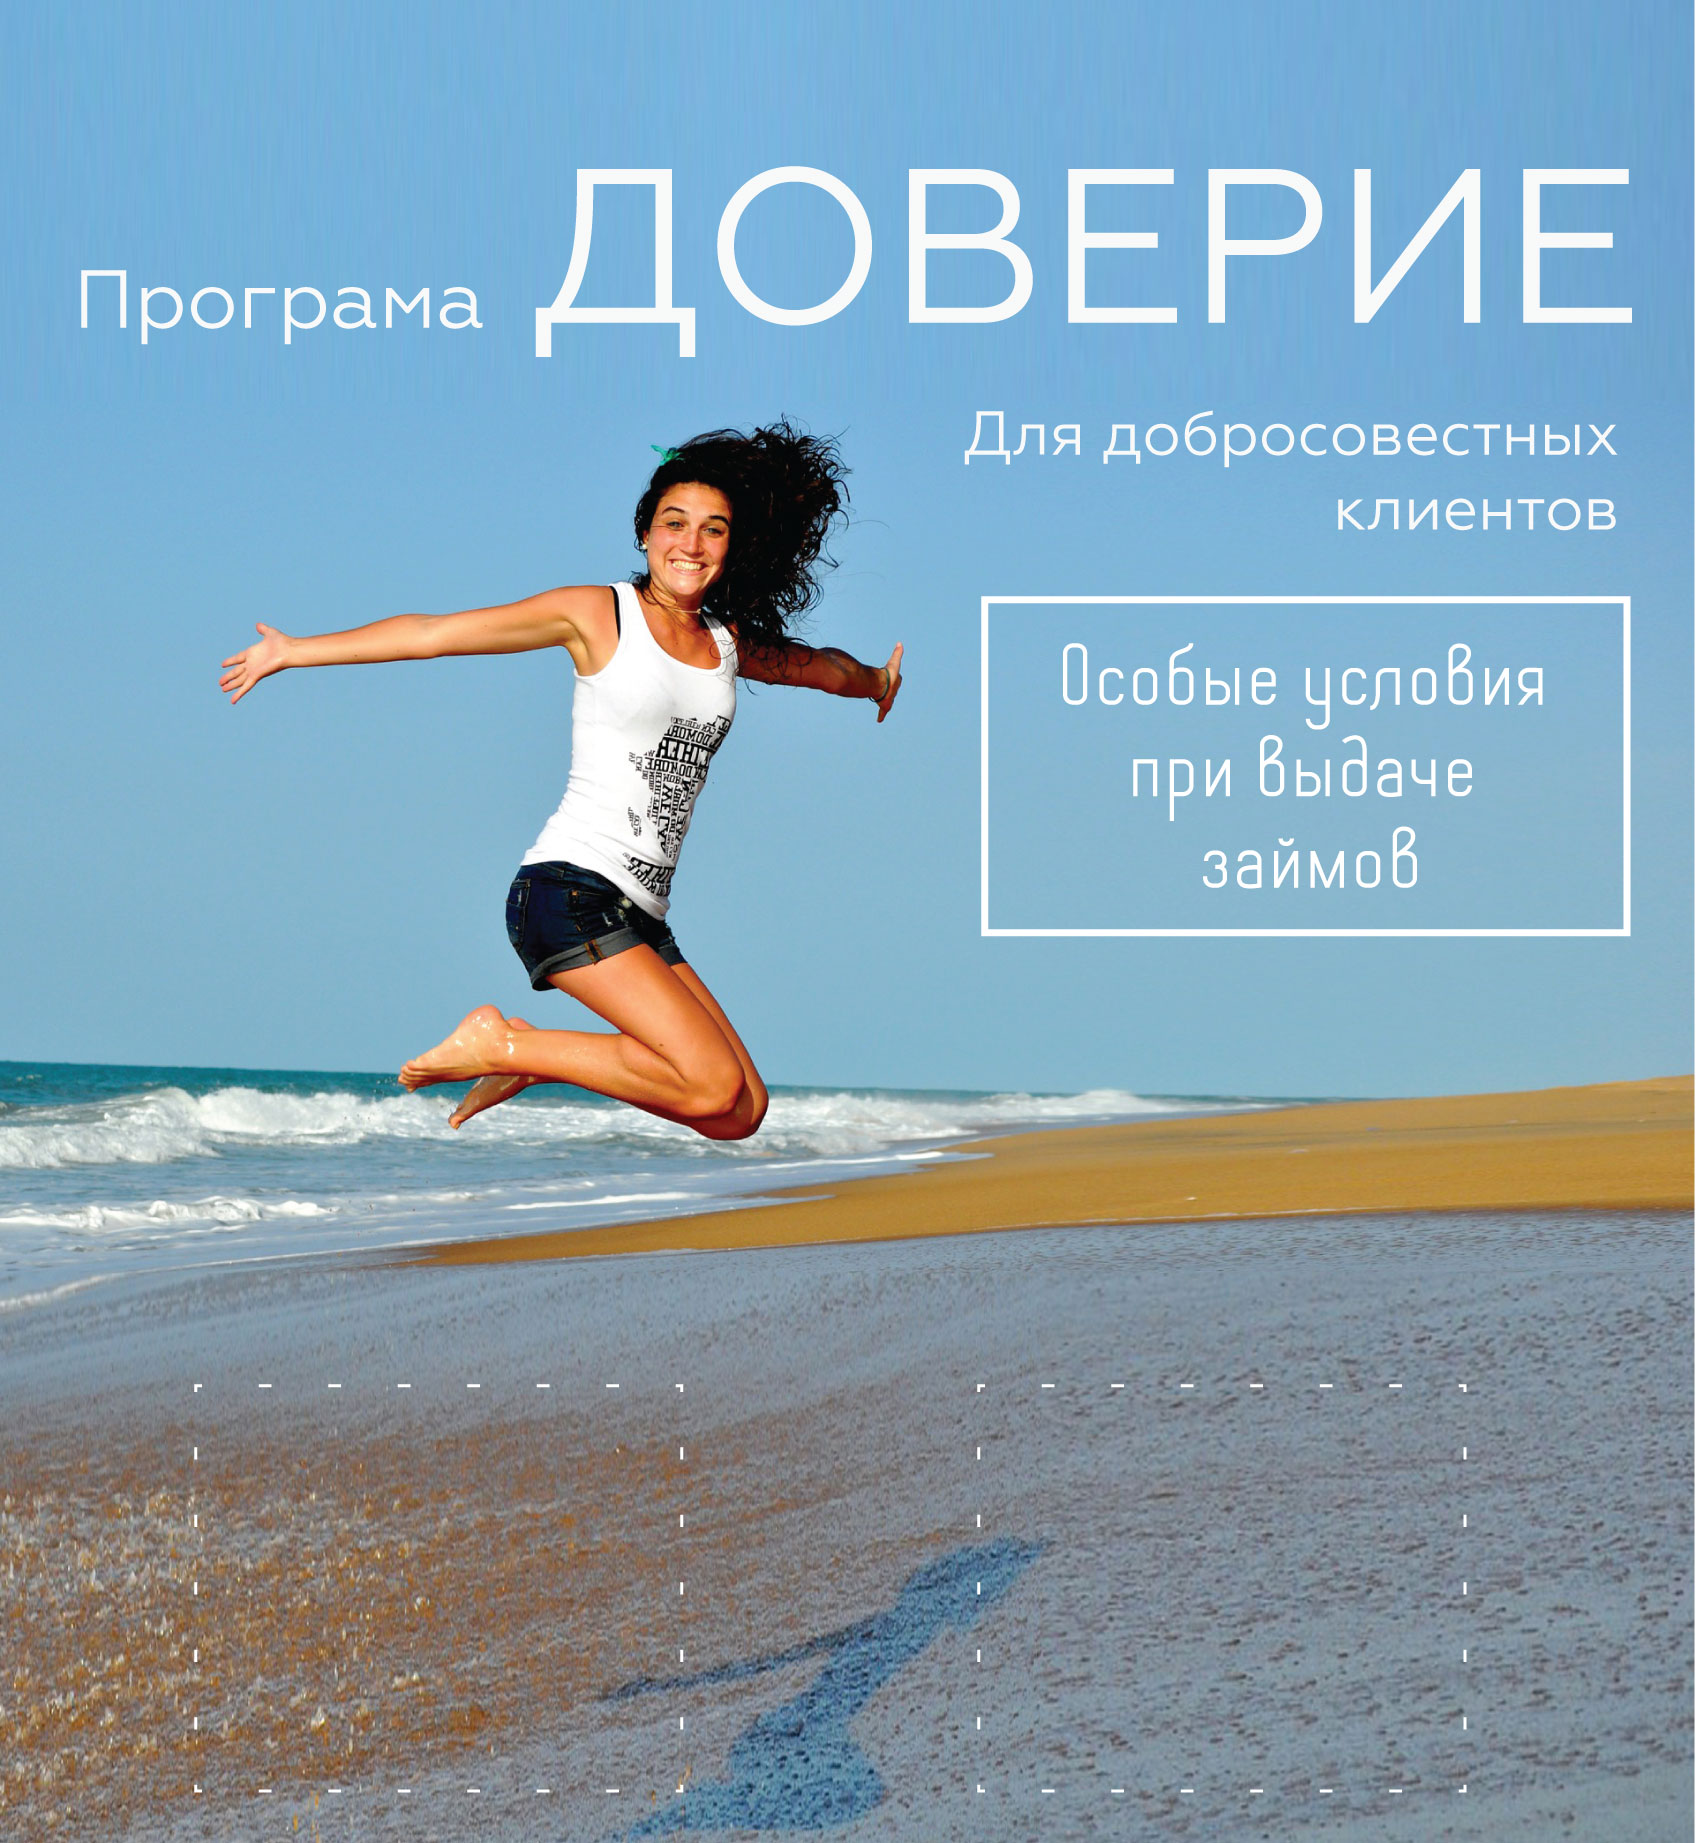 Дизайн плаката по программе лояльности ломбарда фото f_9705c6333b6be199.jpg